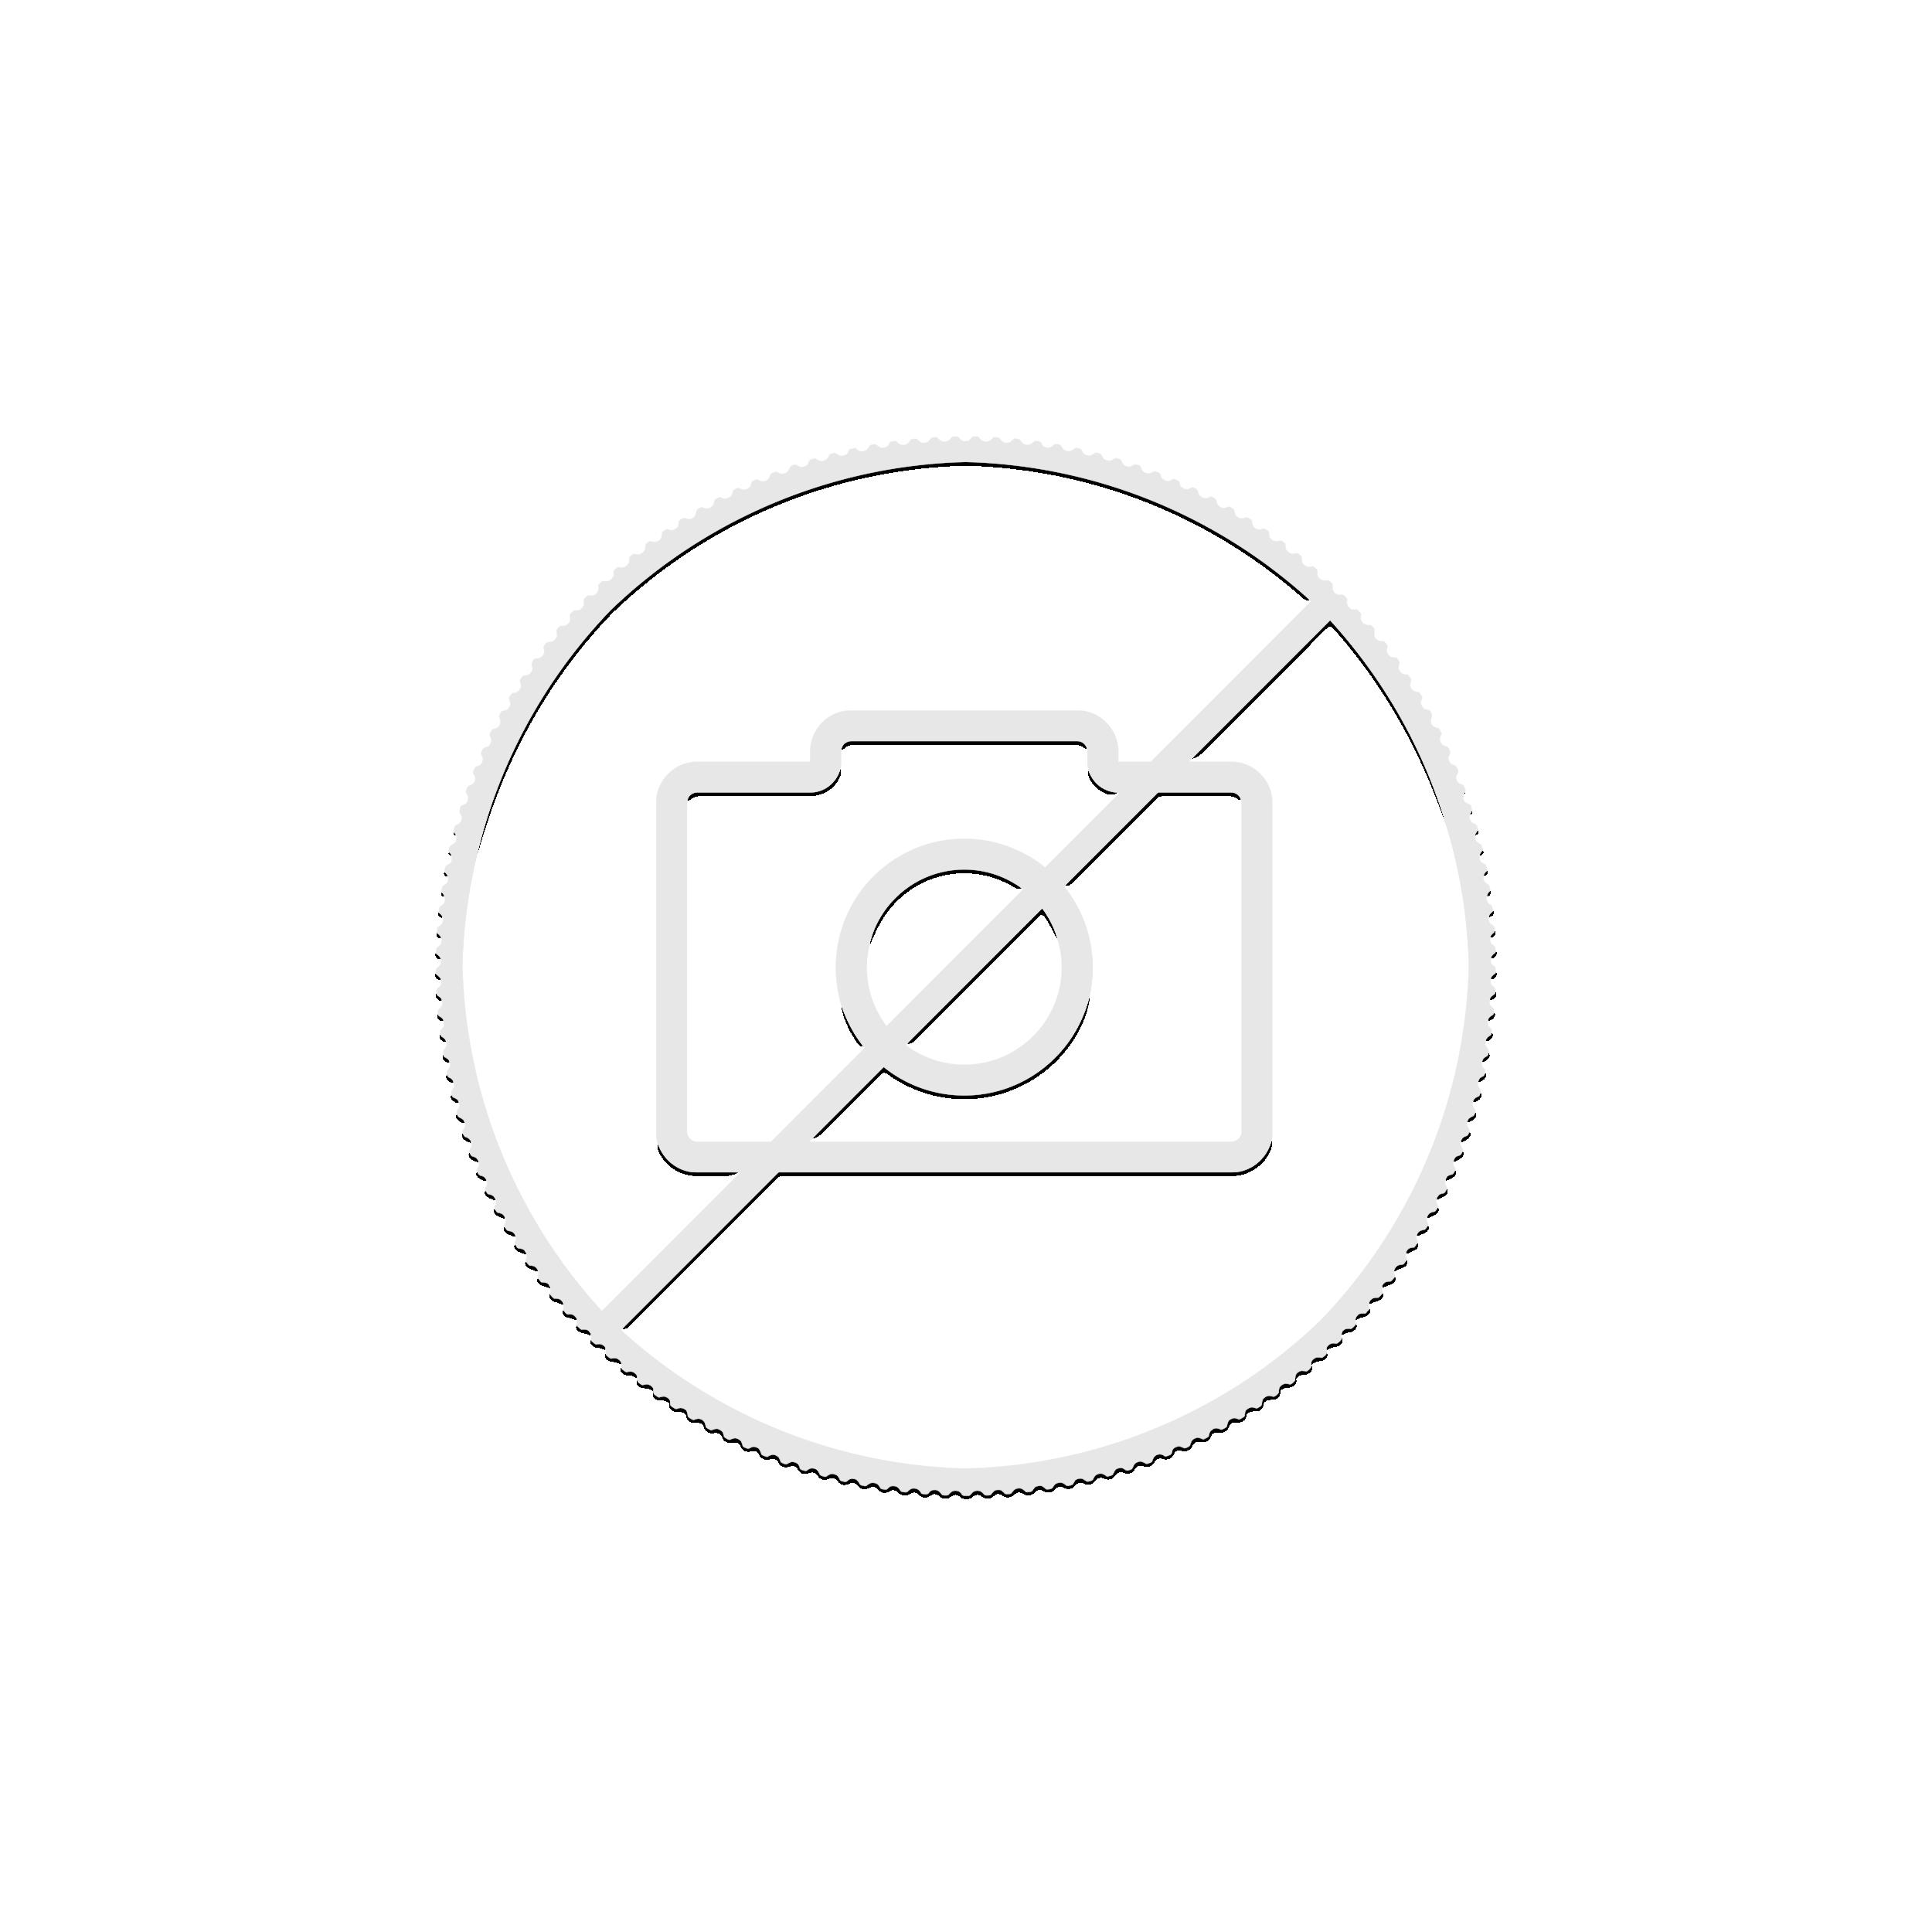 1 troy ounce zilveren munt Happy Birthday 2021